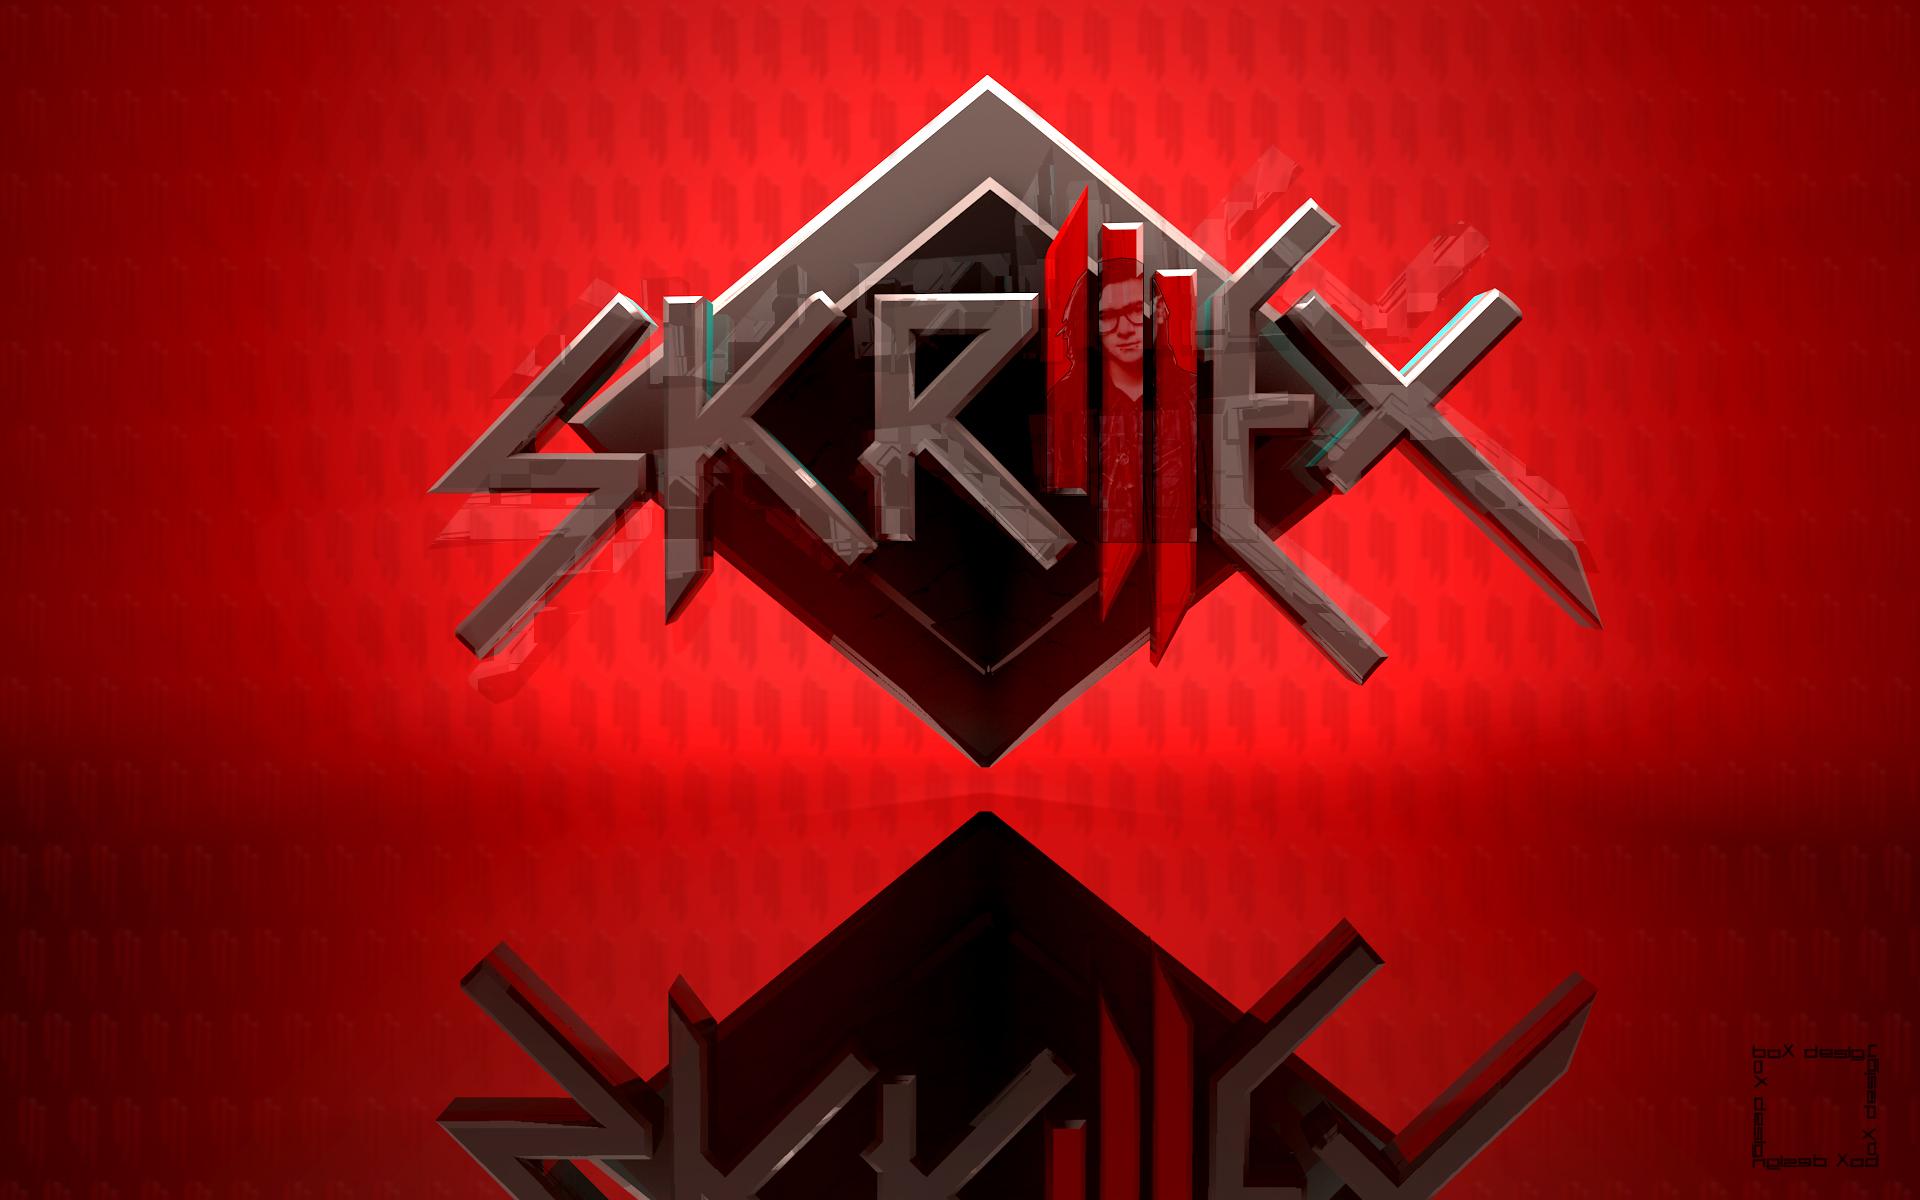 Skrillex wallpaper by boX1515 on DeviantArt